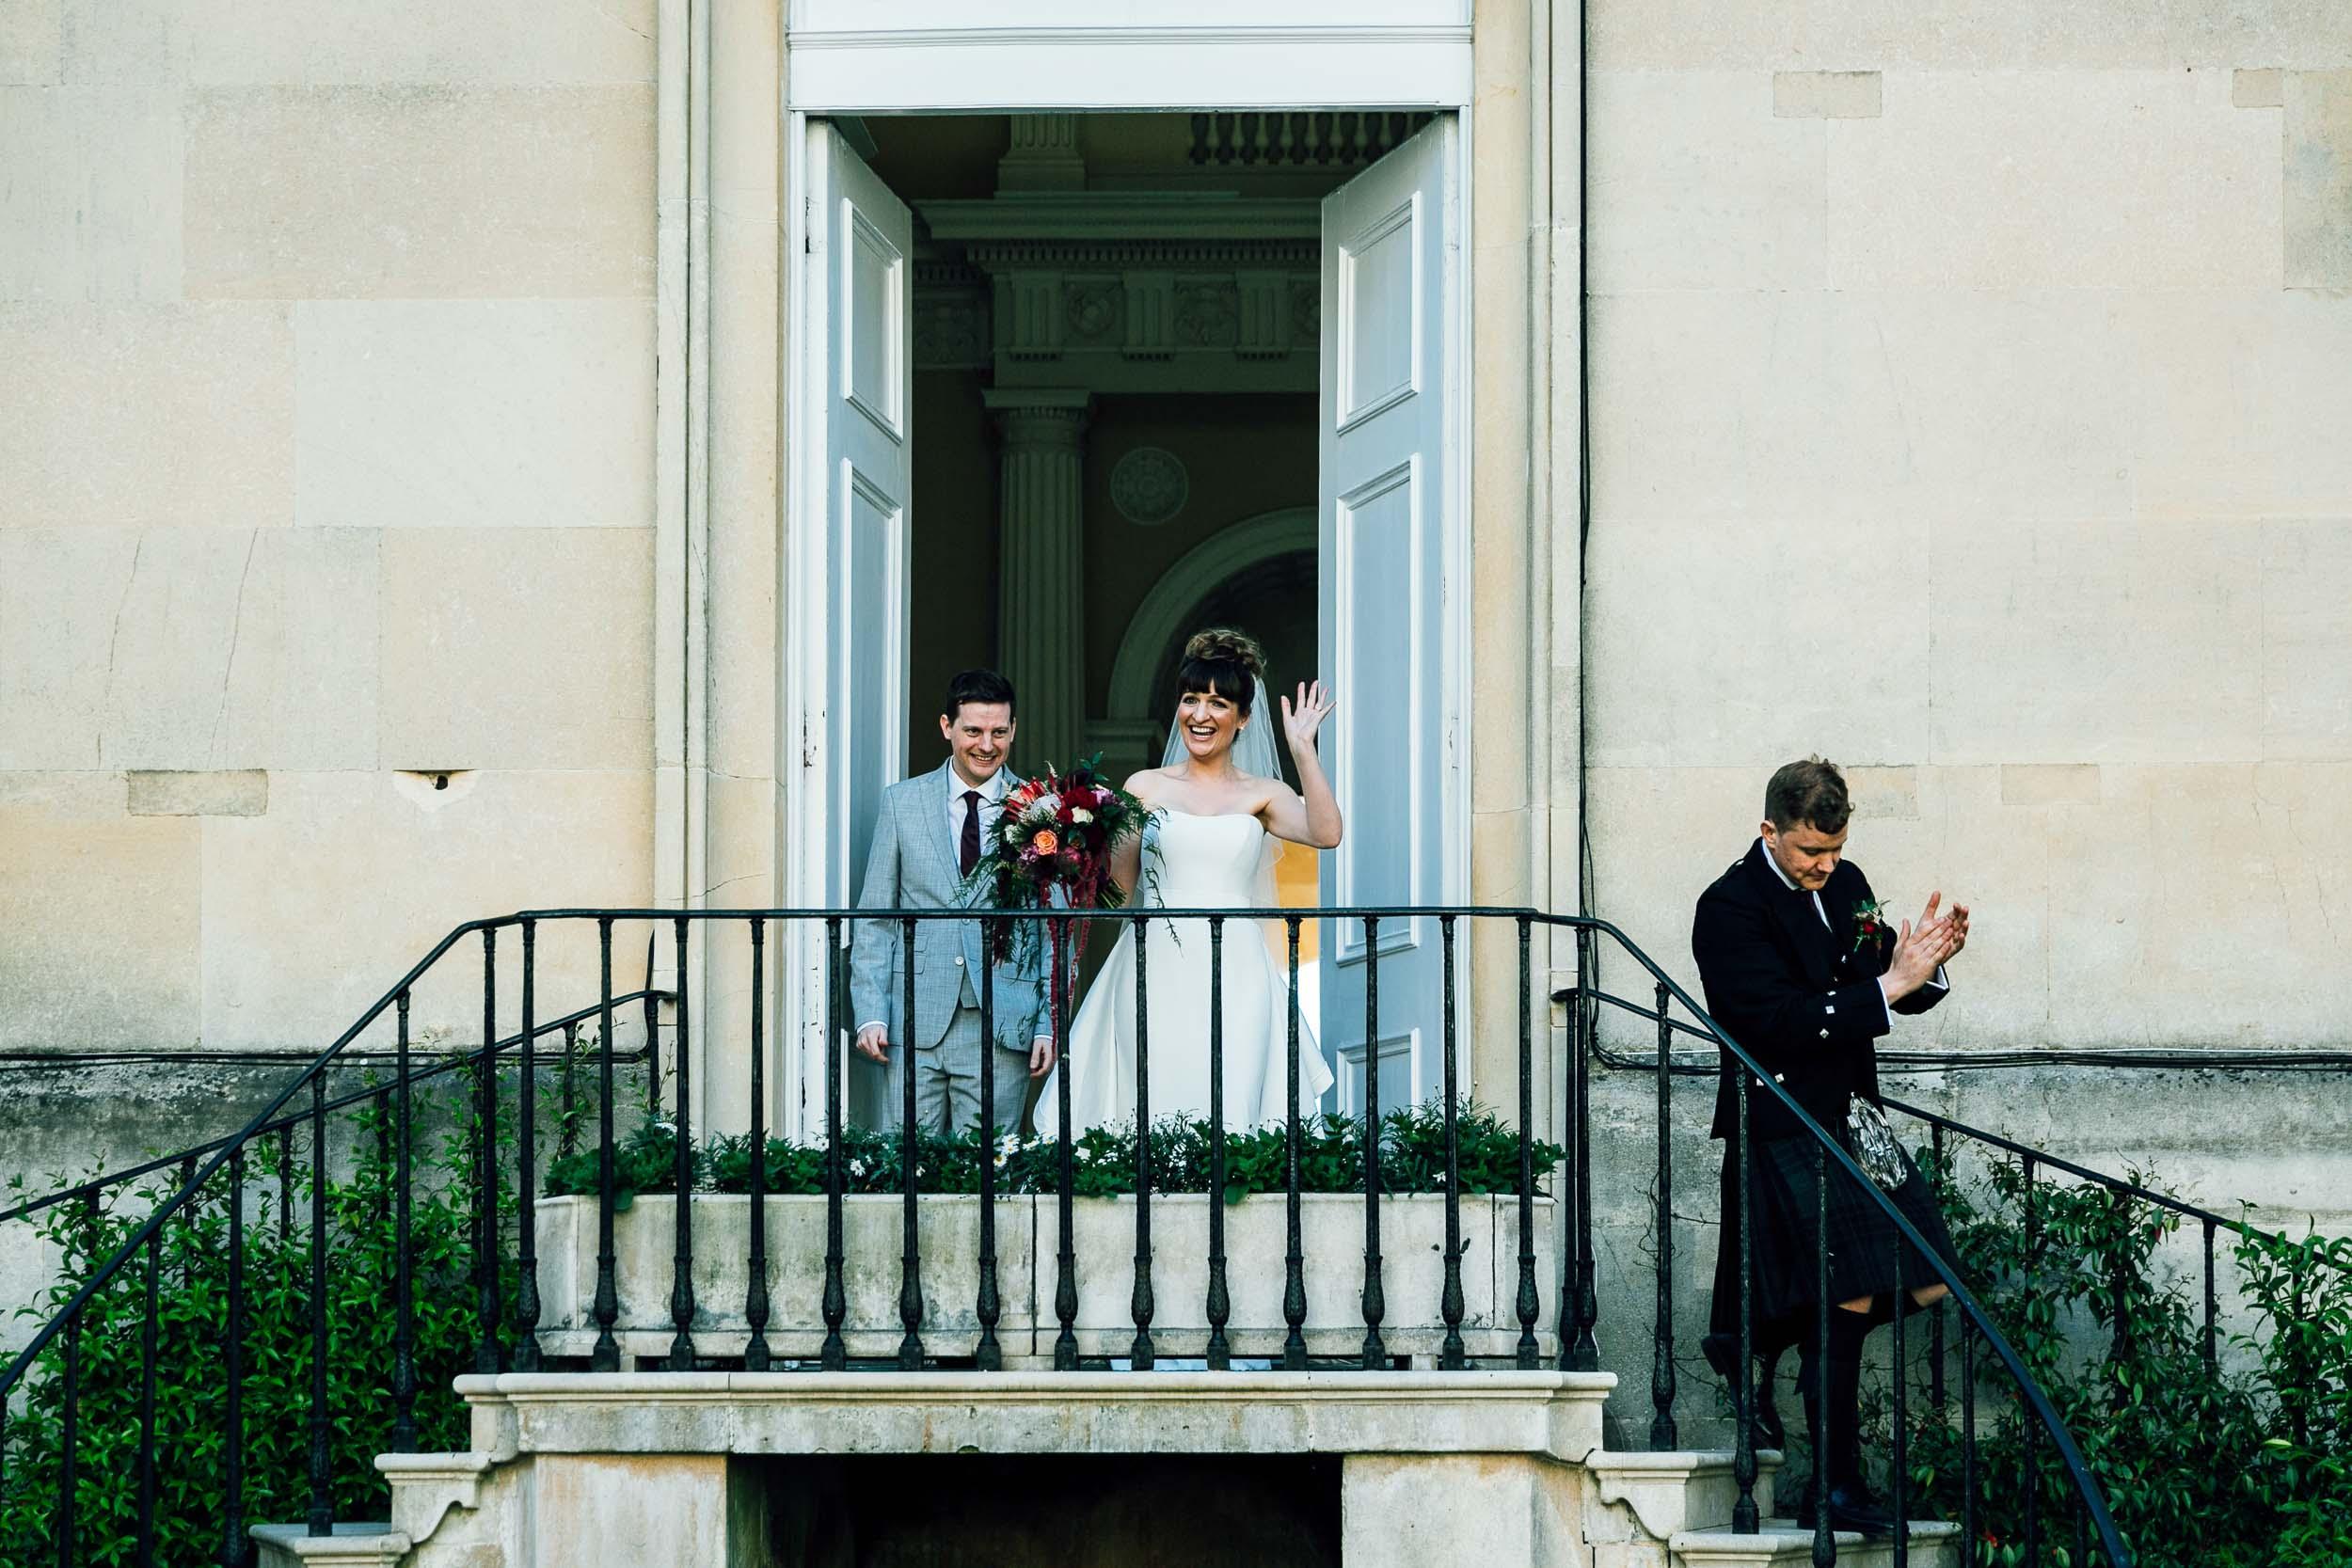 syon-house-wedding-photographer-london 092.jpg